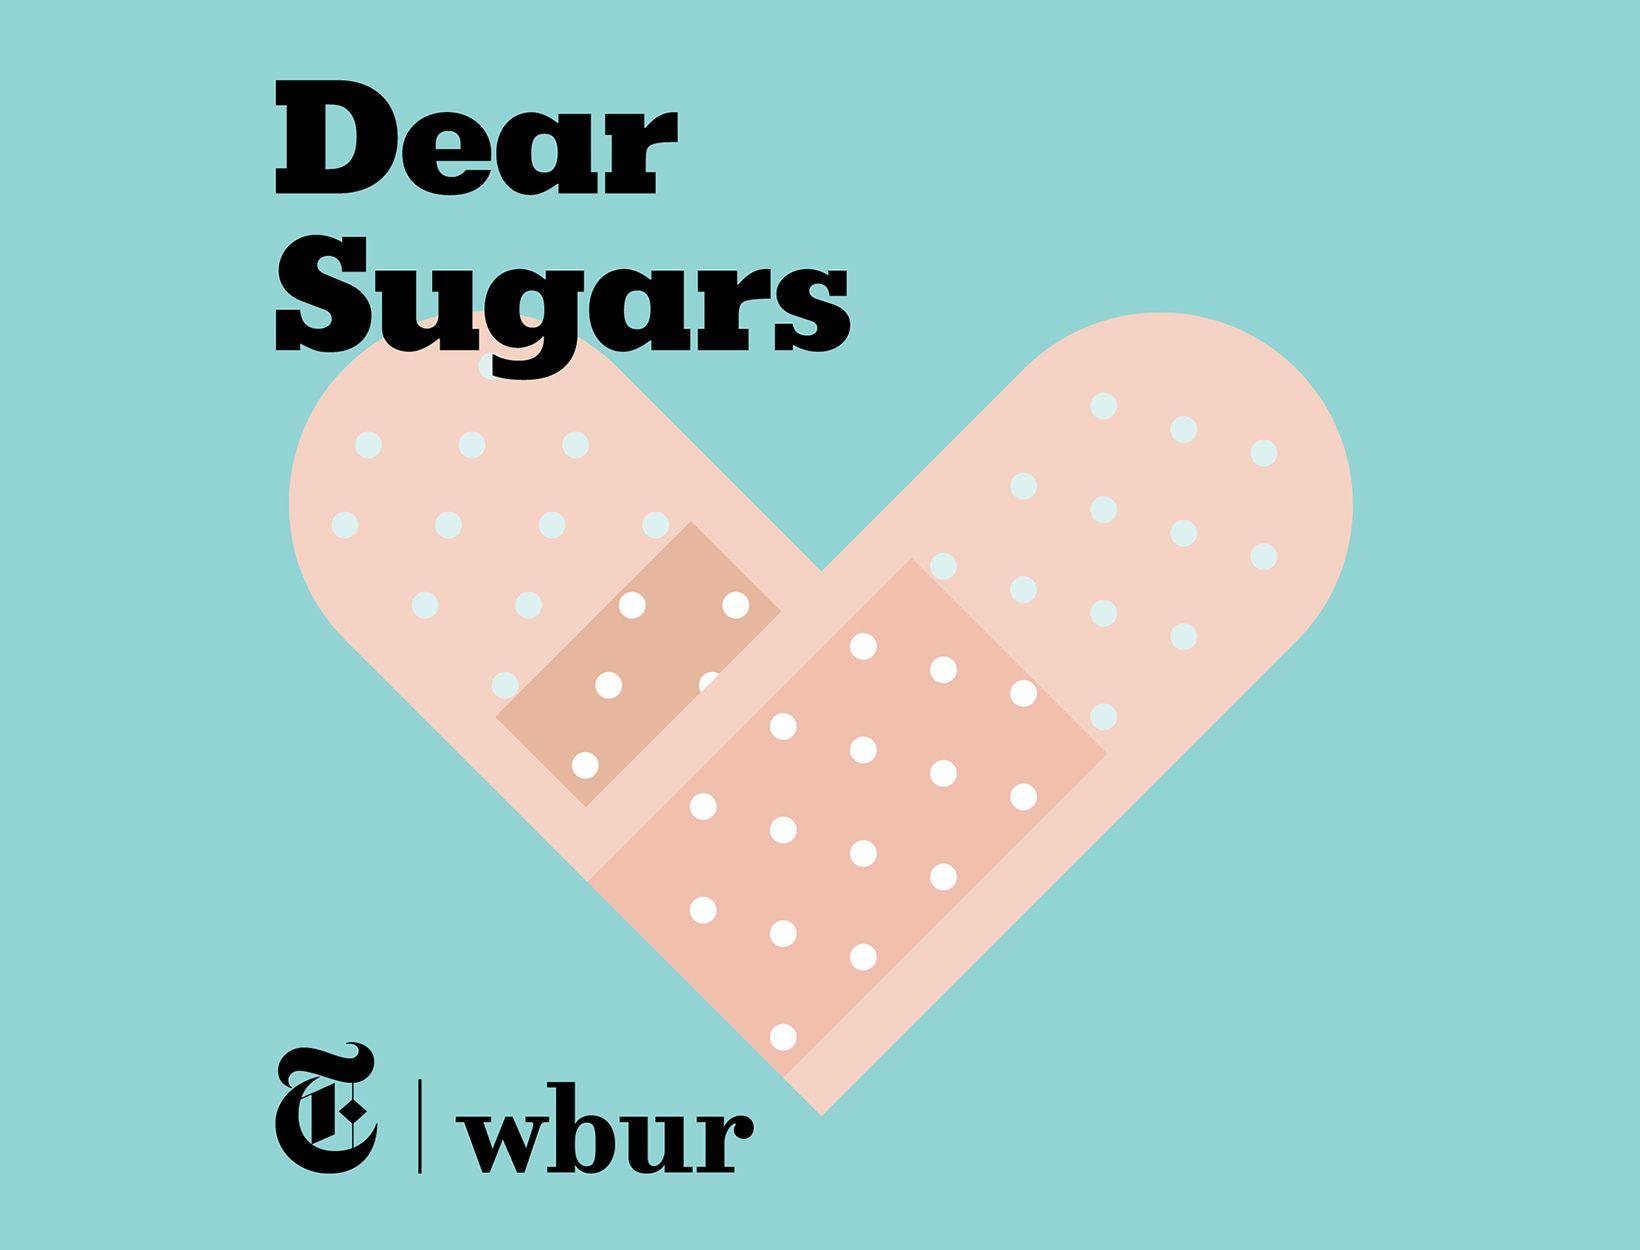 Dear sugar single mom